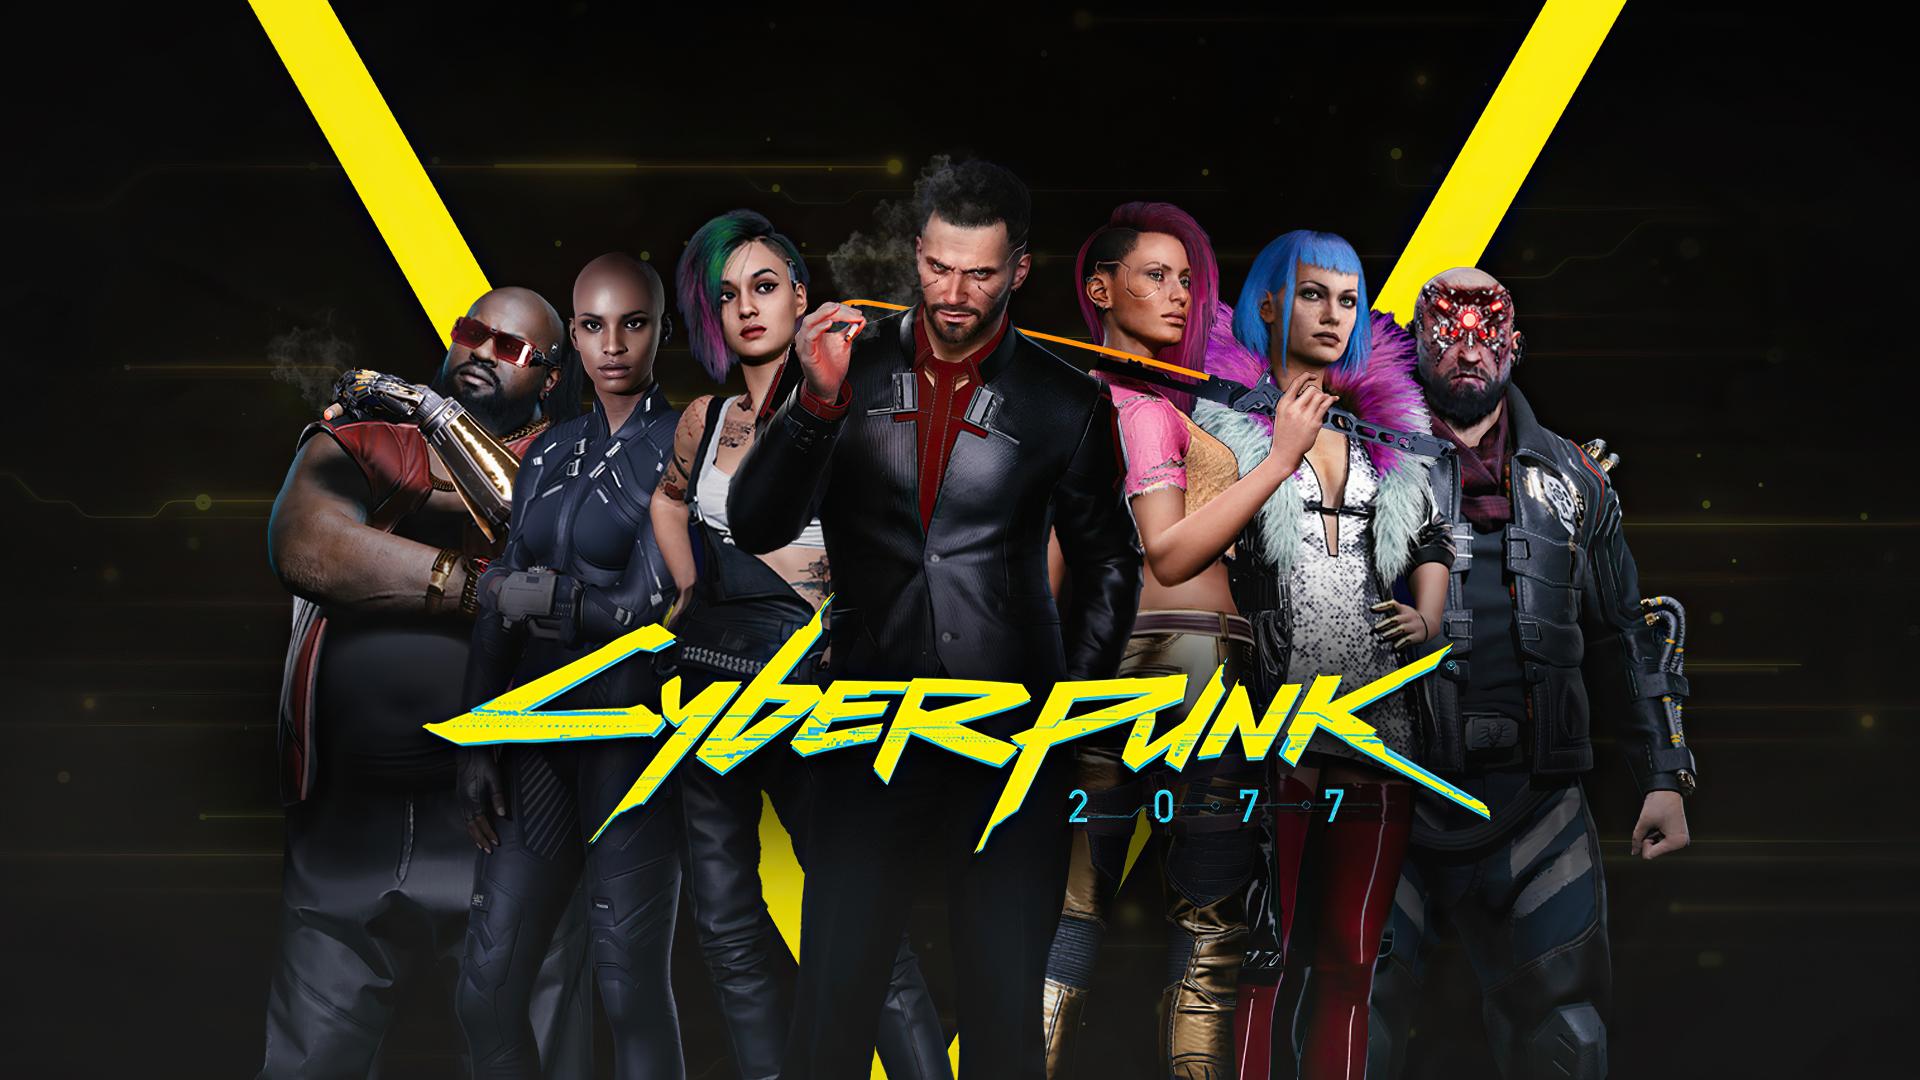 1920x1080 Cyberpunk 2077 4k Characters 1080P Laptop Full ...